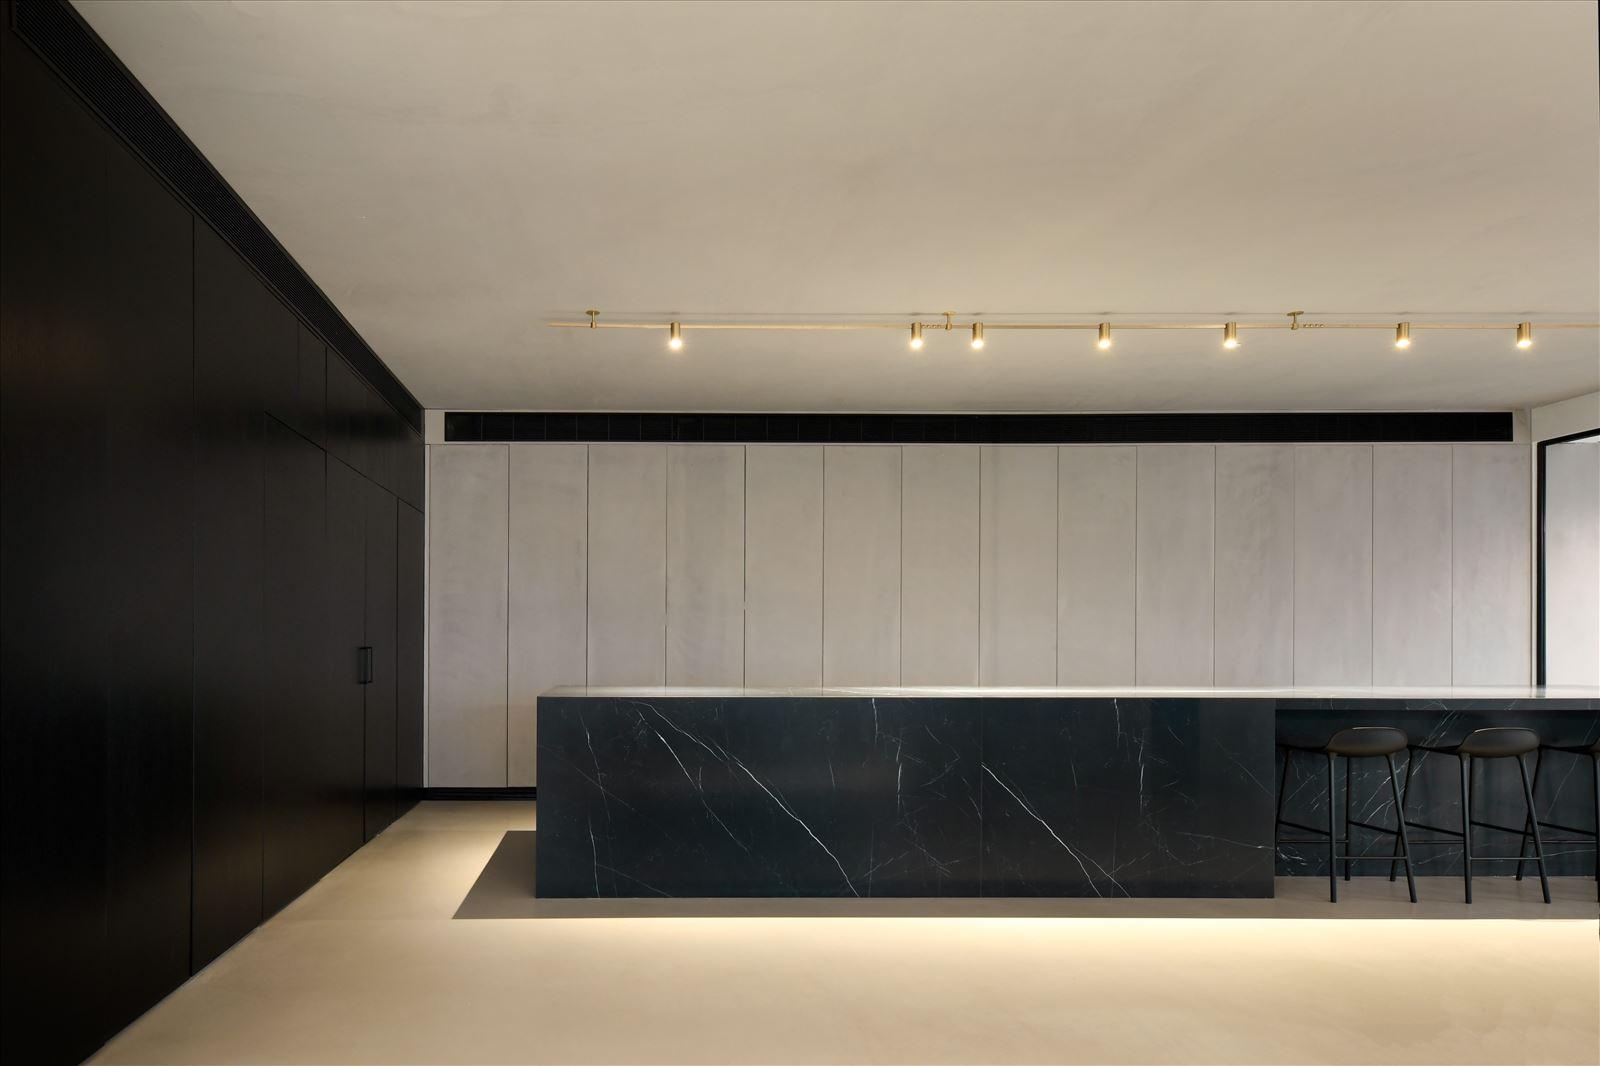 Divident office גוף תאורה מעל מזנון המשרד בעיצובו של קמחי תאורה